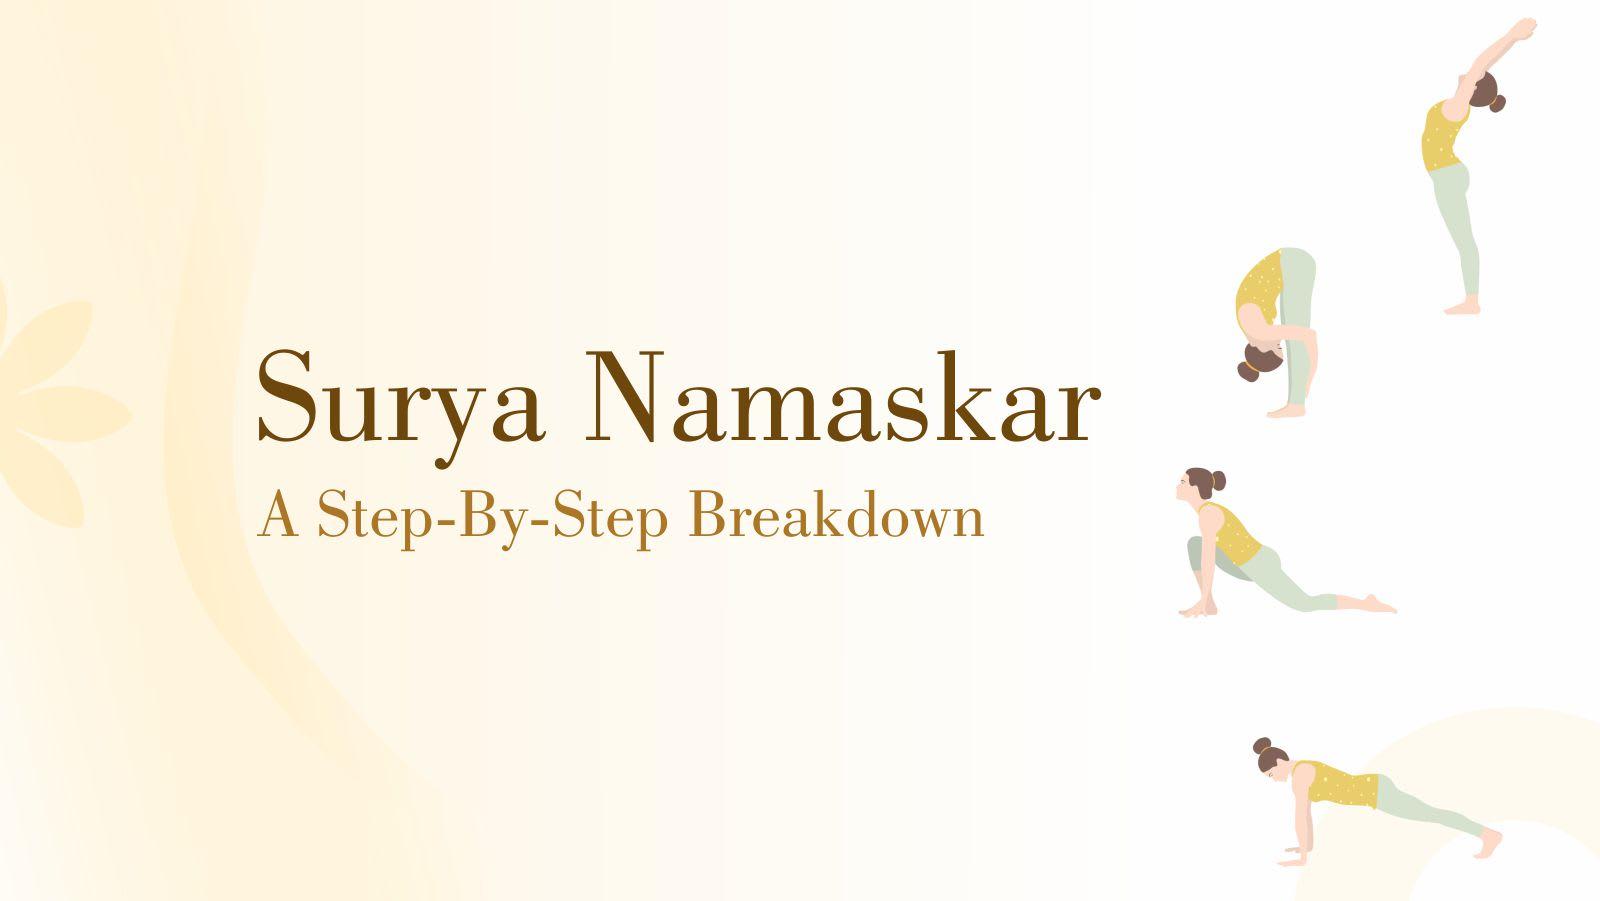 surya namaskar step by step breakdown, yoga, yoga poses, yoga pose, surya namaskar, morning meditation, surya namaskar, choreo n concept, fitness, workout, health, balanced life